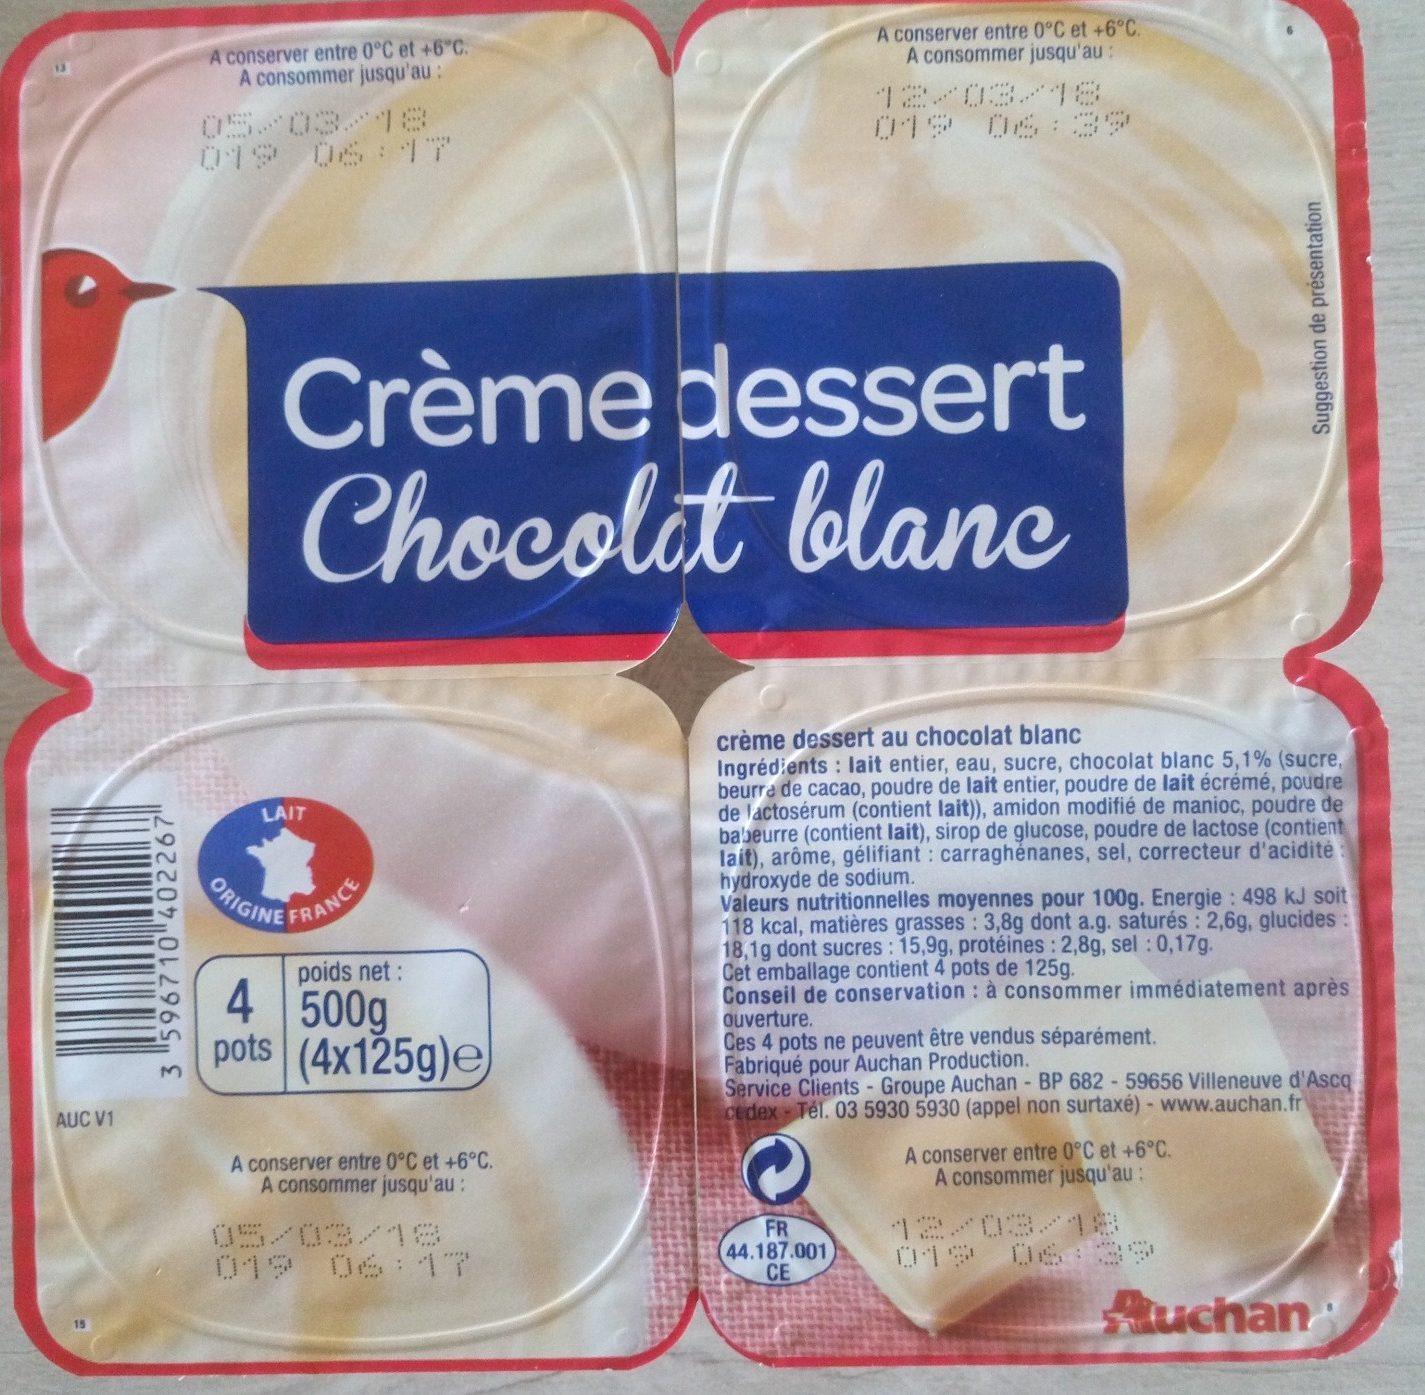 Crème dessert chocolat blanc - Product